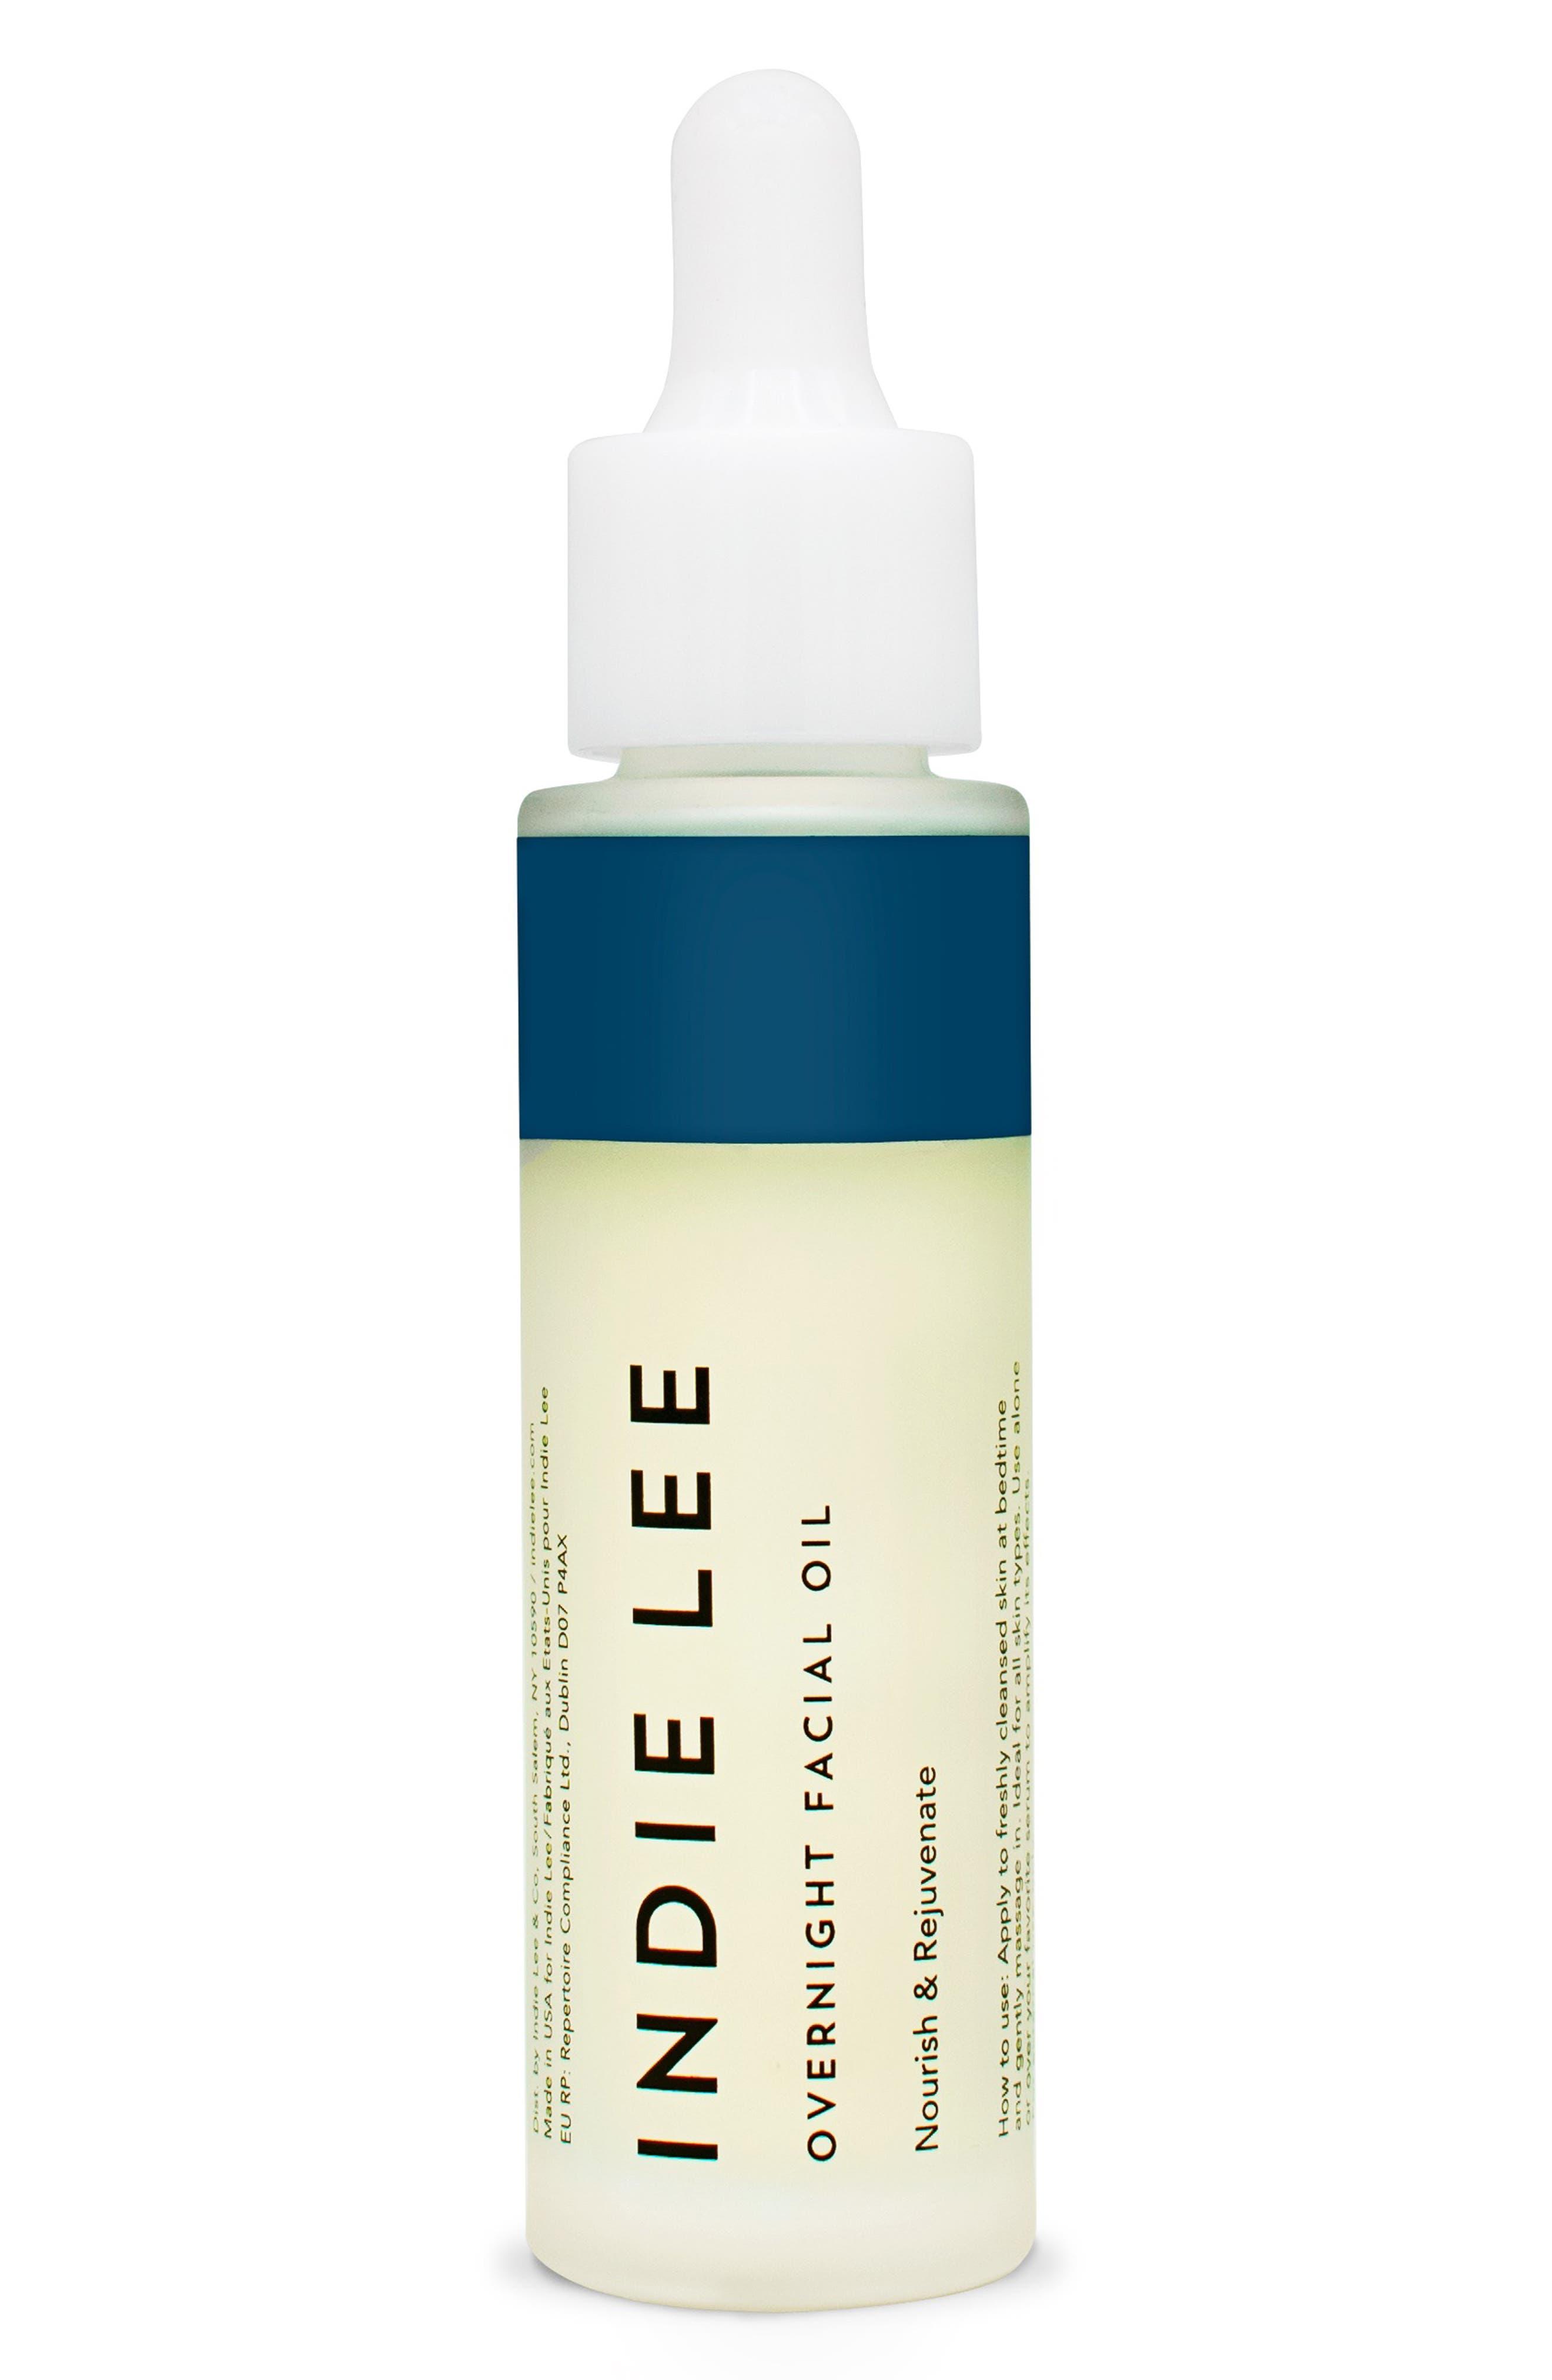 Nourish & Rejuvenate Overnight Facial Oil